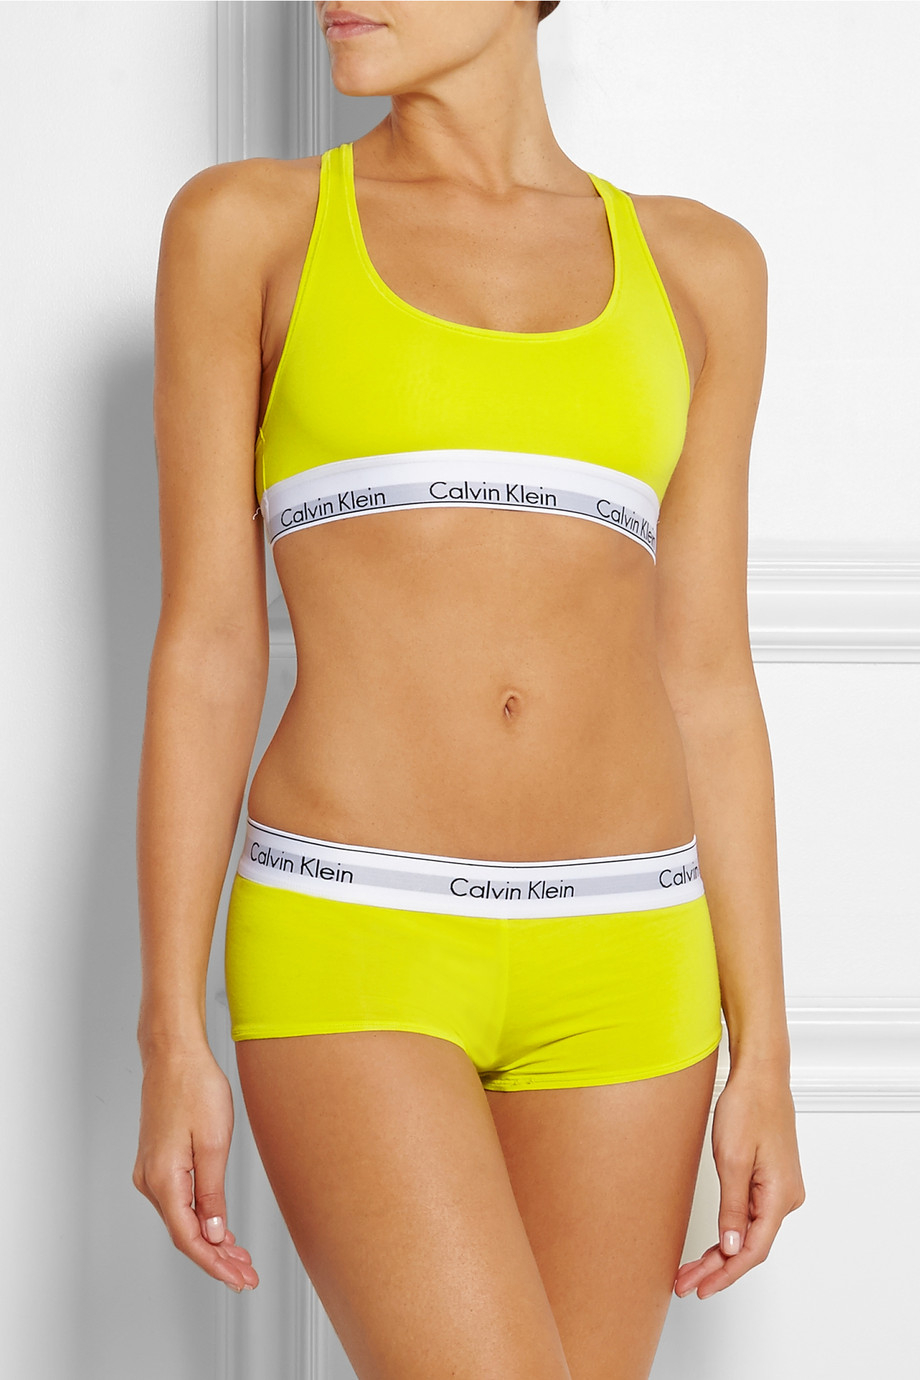 Lyst - Calvin Klein Modern Stretch Cotton-Blend Soft-Cup Bra in Yellow 01a36c178